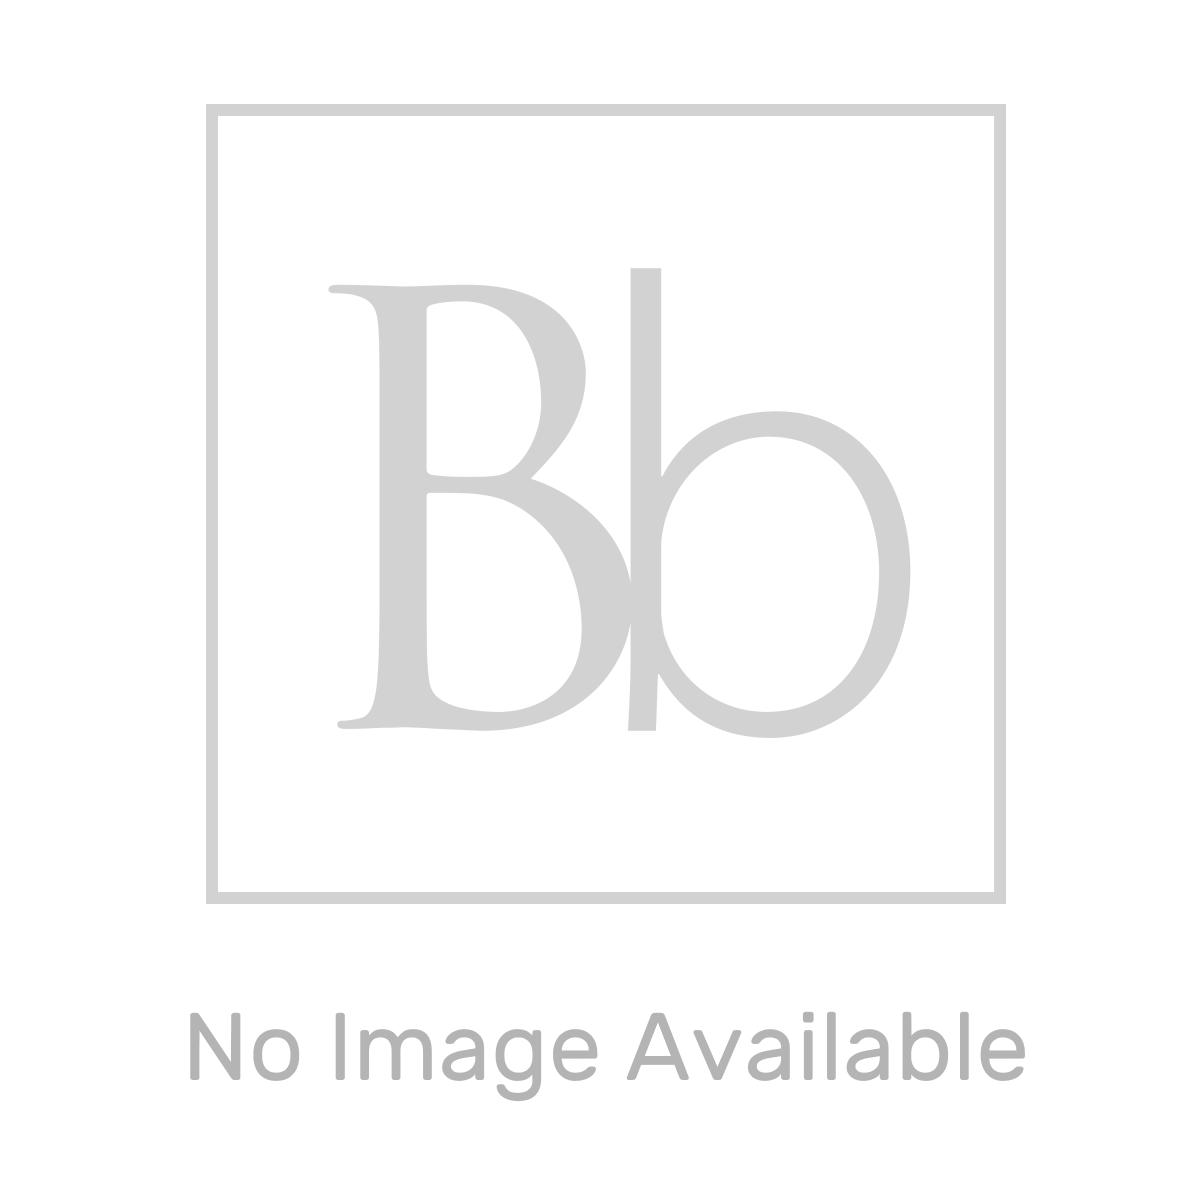 RAK Ecofix Slimline Concealed Cistern 500 x 1140mm